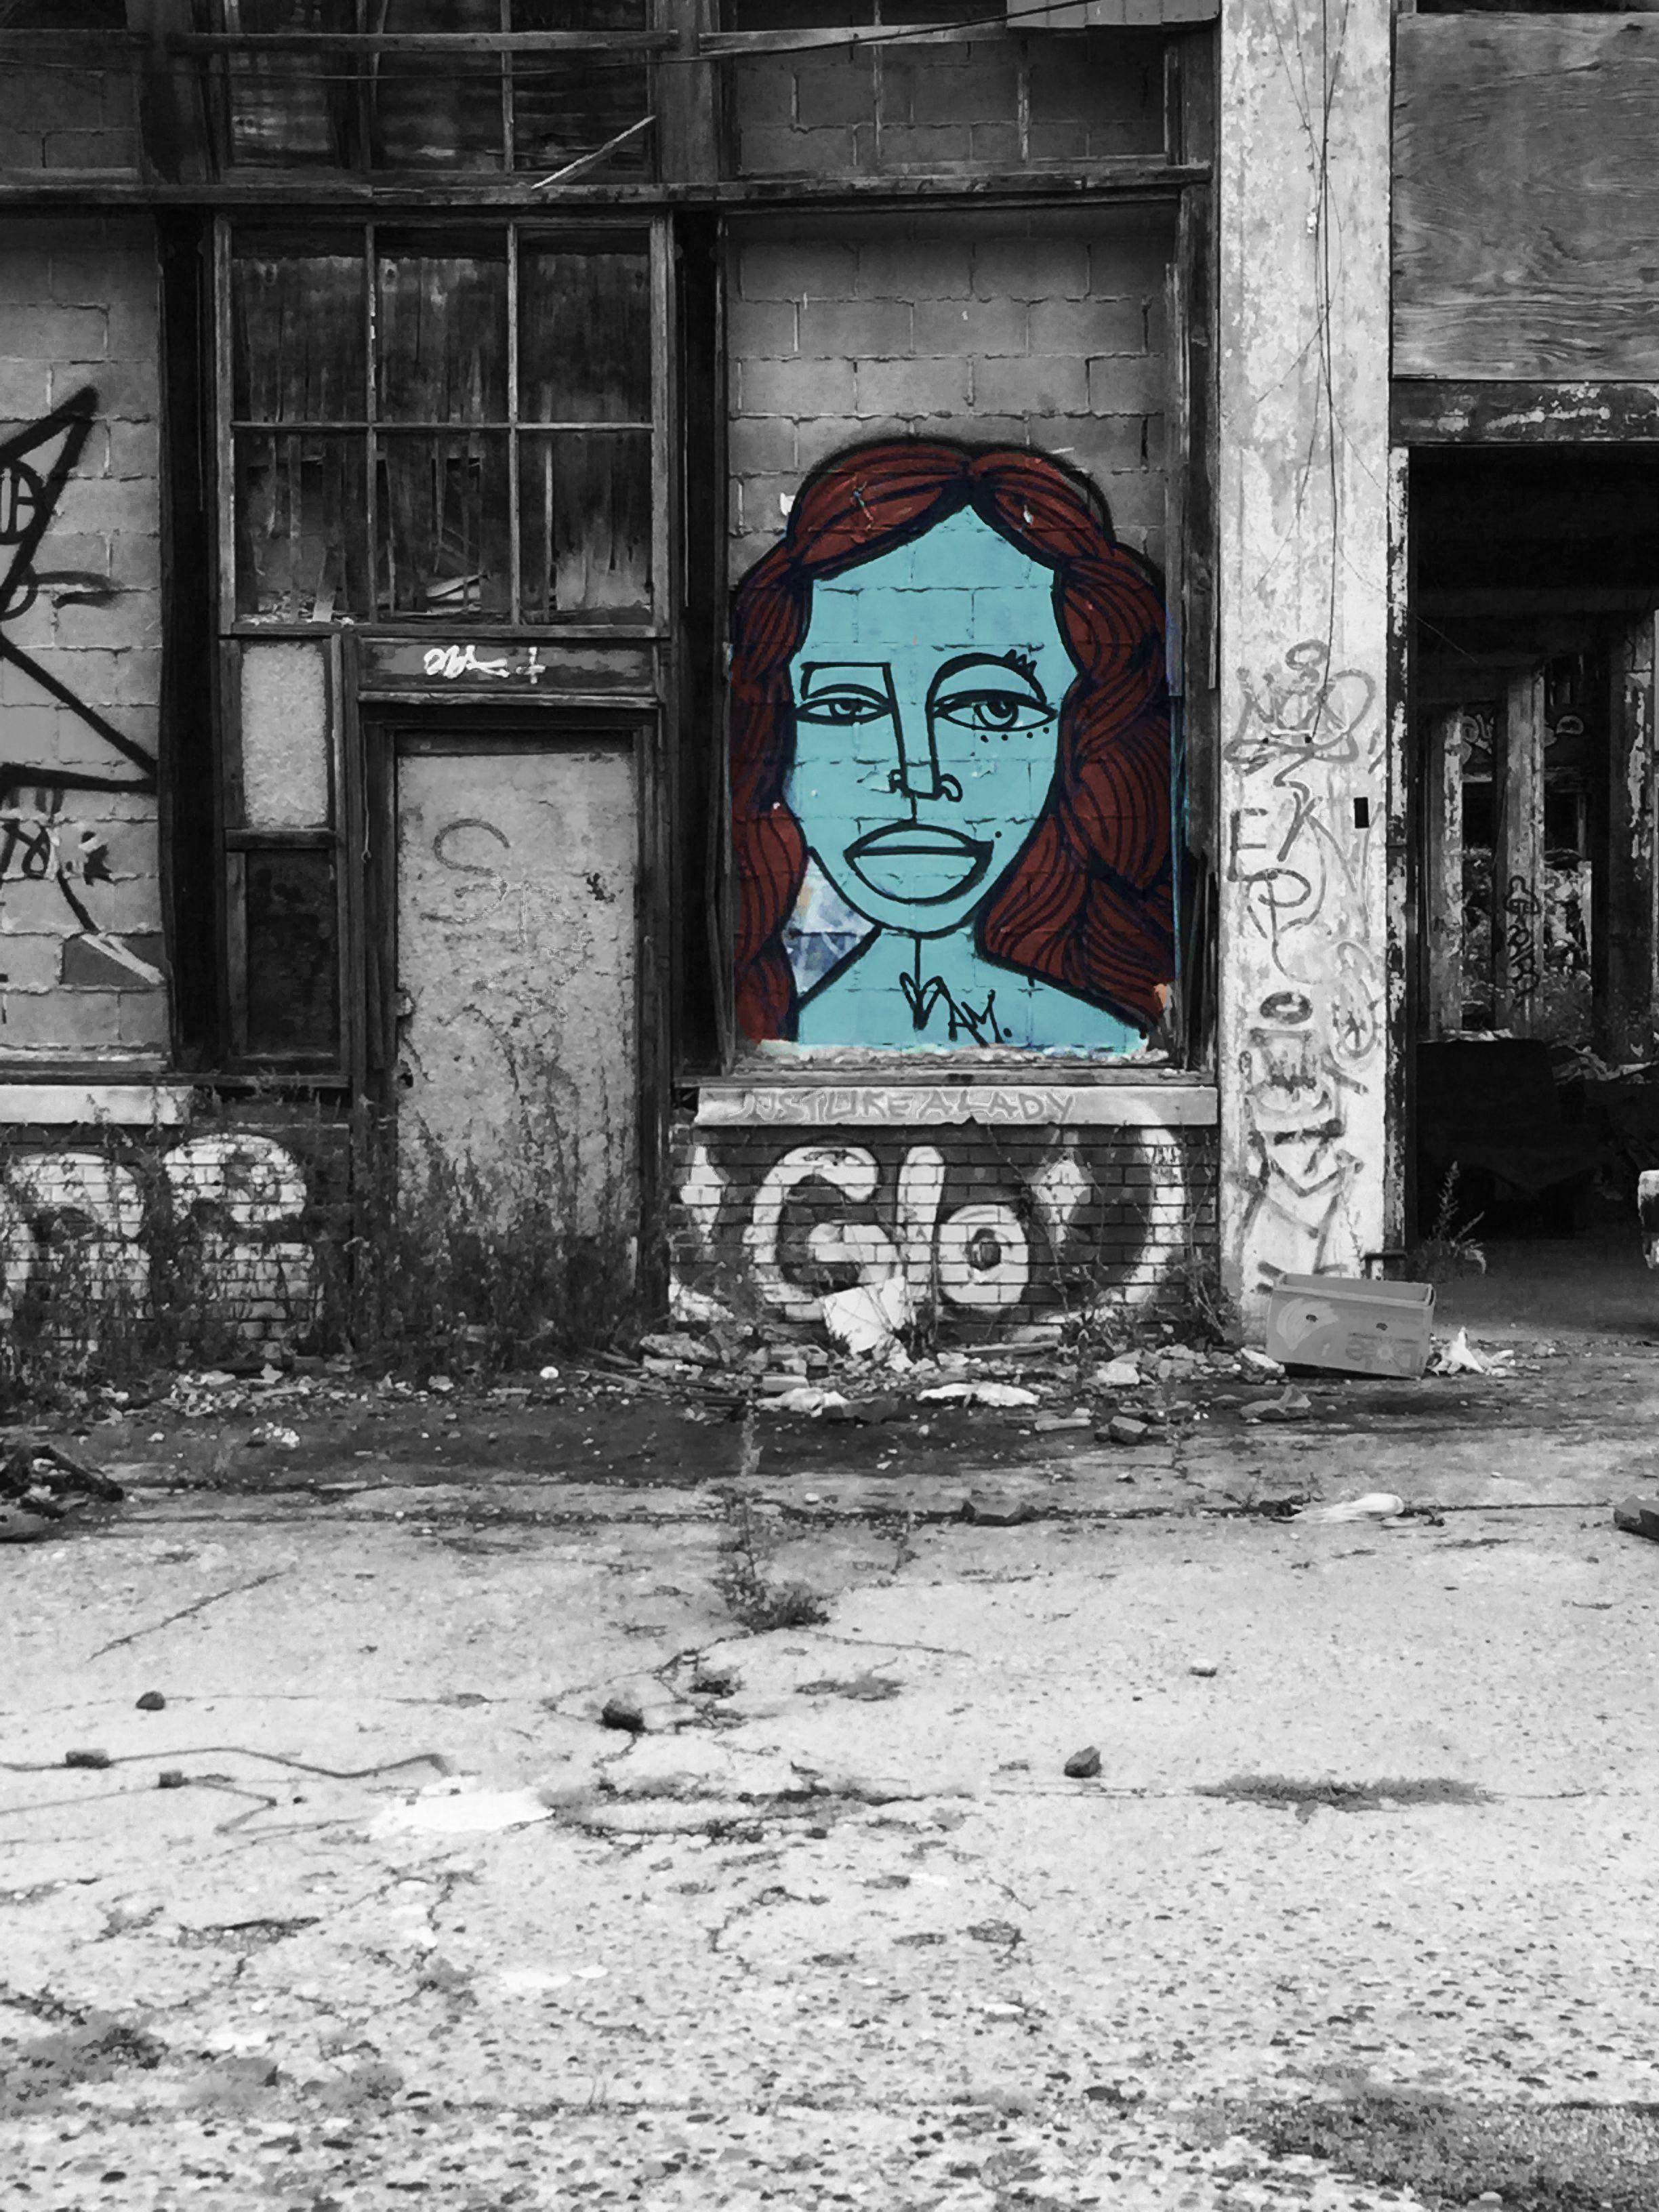 Graffiti packard manufacturing plant detroit mi snapshots from my